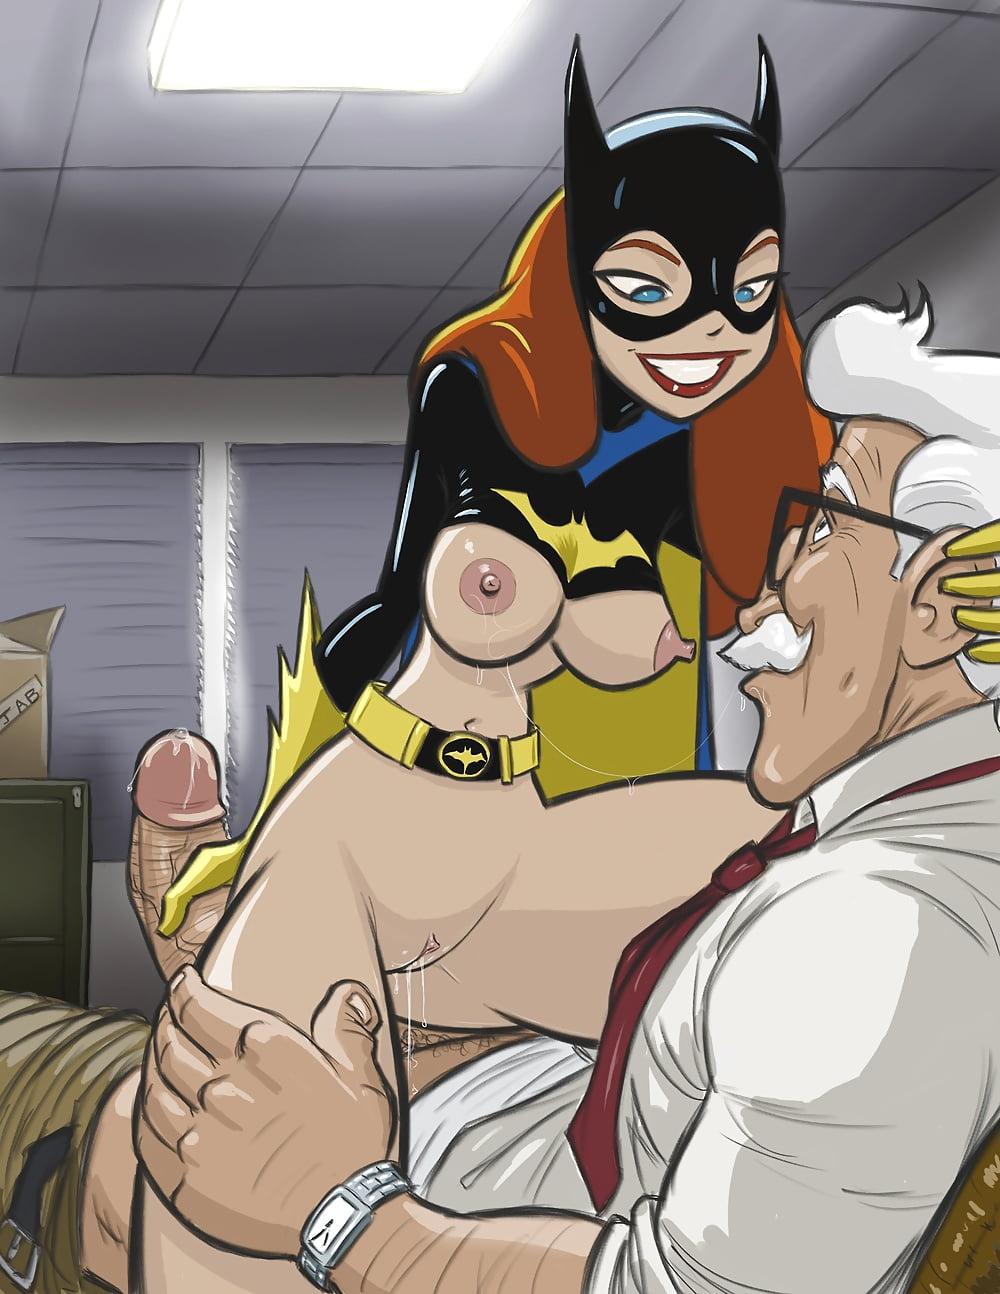 Vides bat fucking, paula zahn puss